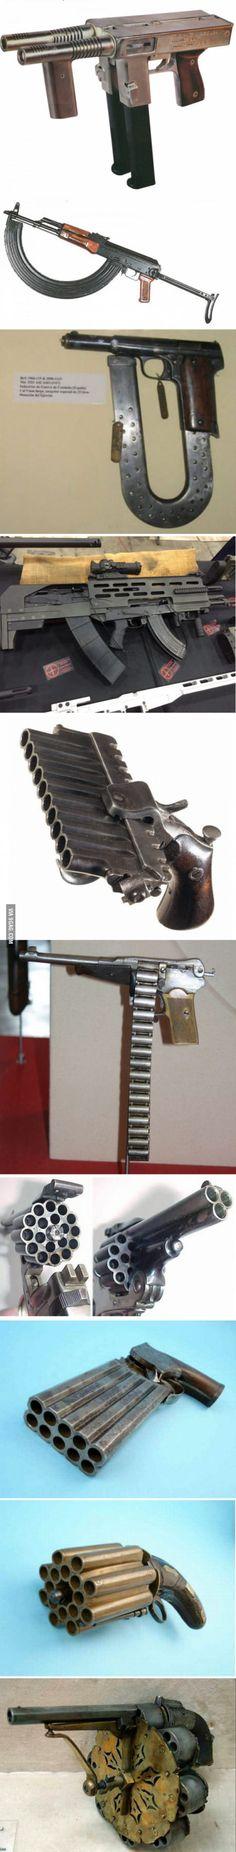 Rare guns Find our speedloader now! http://www.amazon.com/shops/raeind